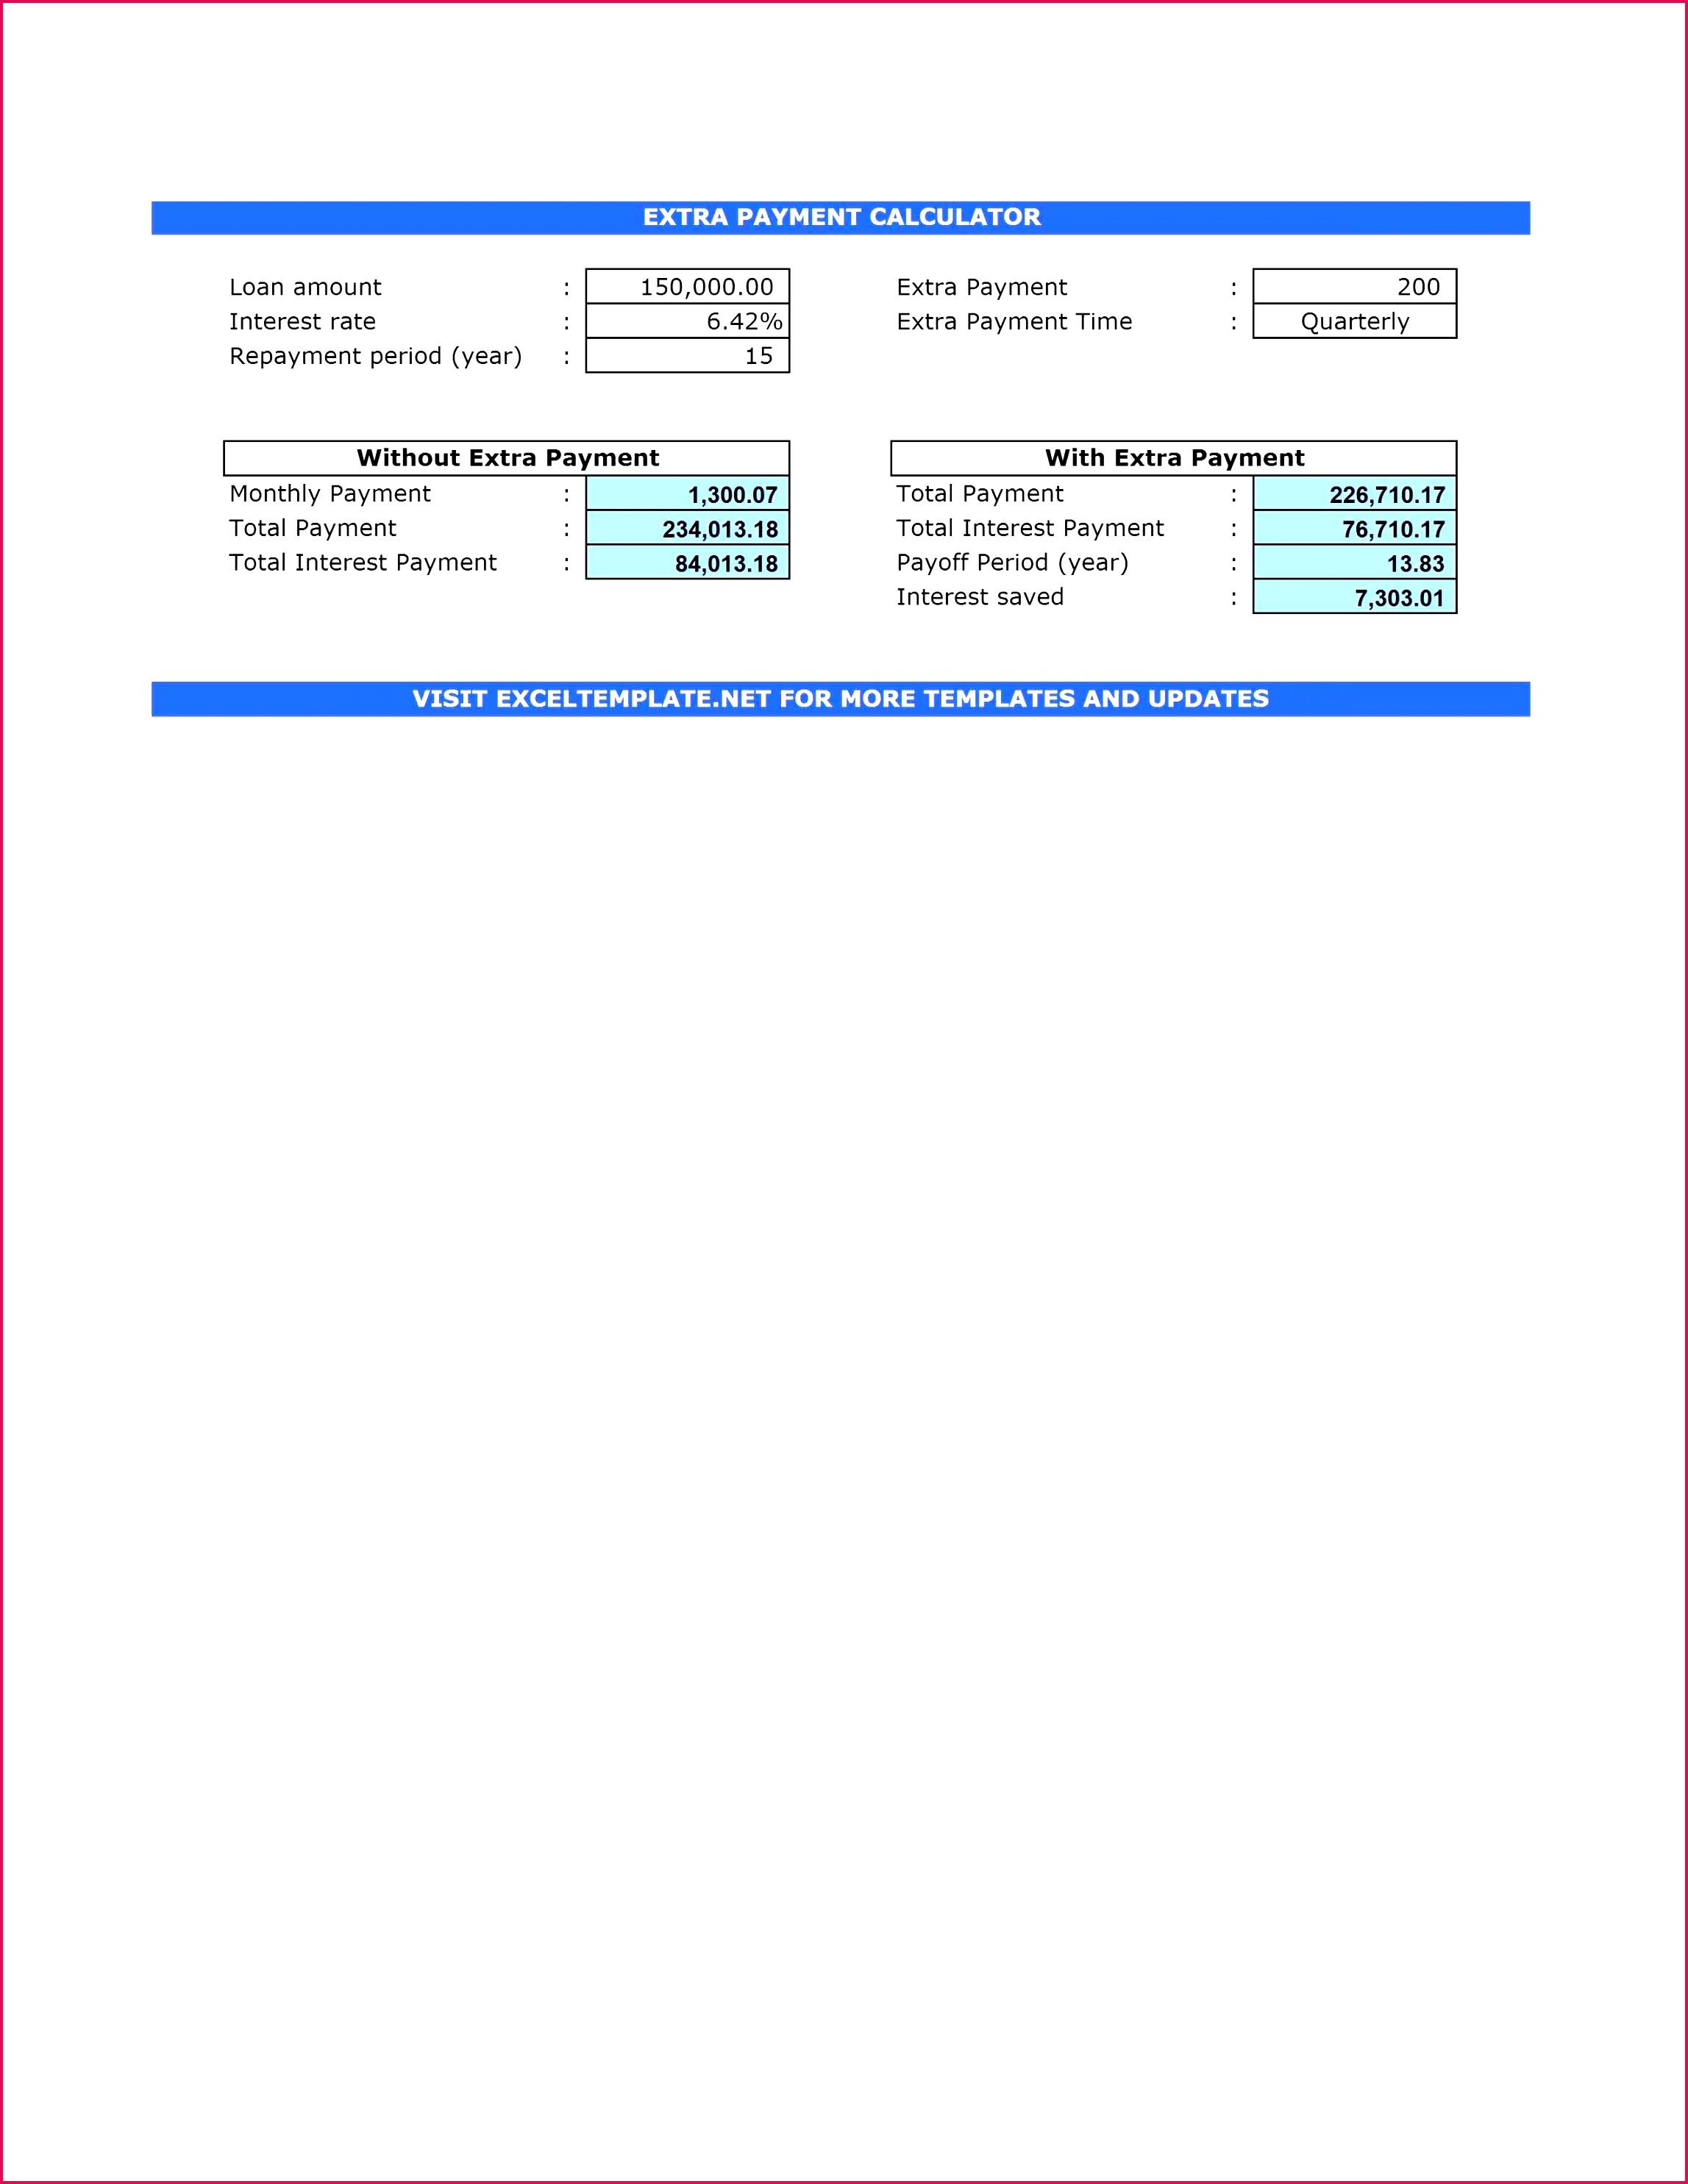 Car Loan Amortization Schedule Excel Luxury Car Loan Amortization Schedule Excel Best Car Loan Excel Template